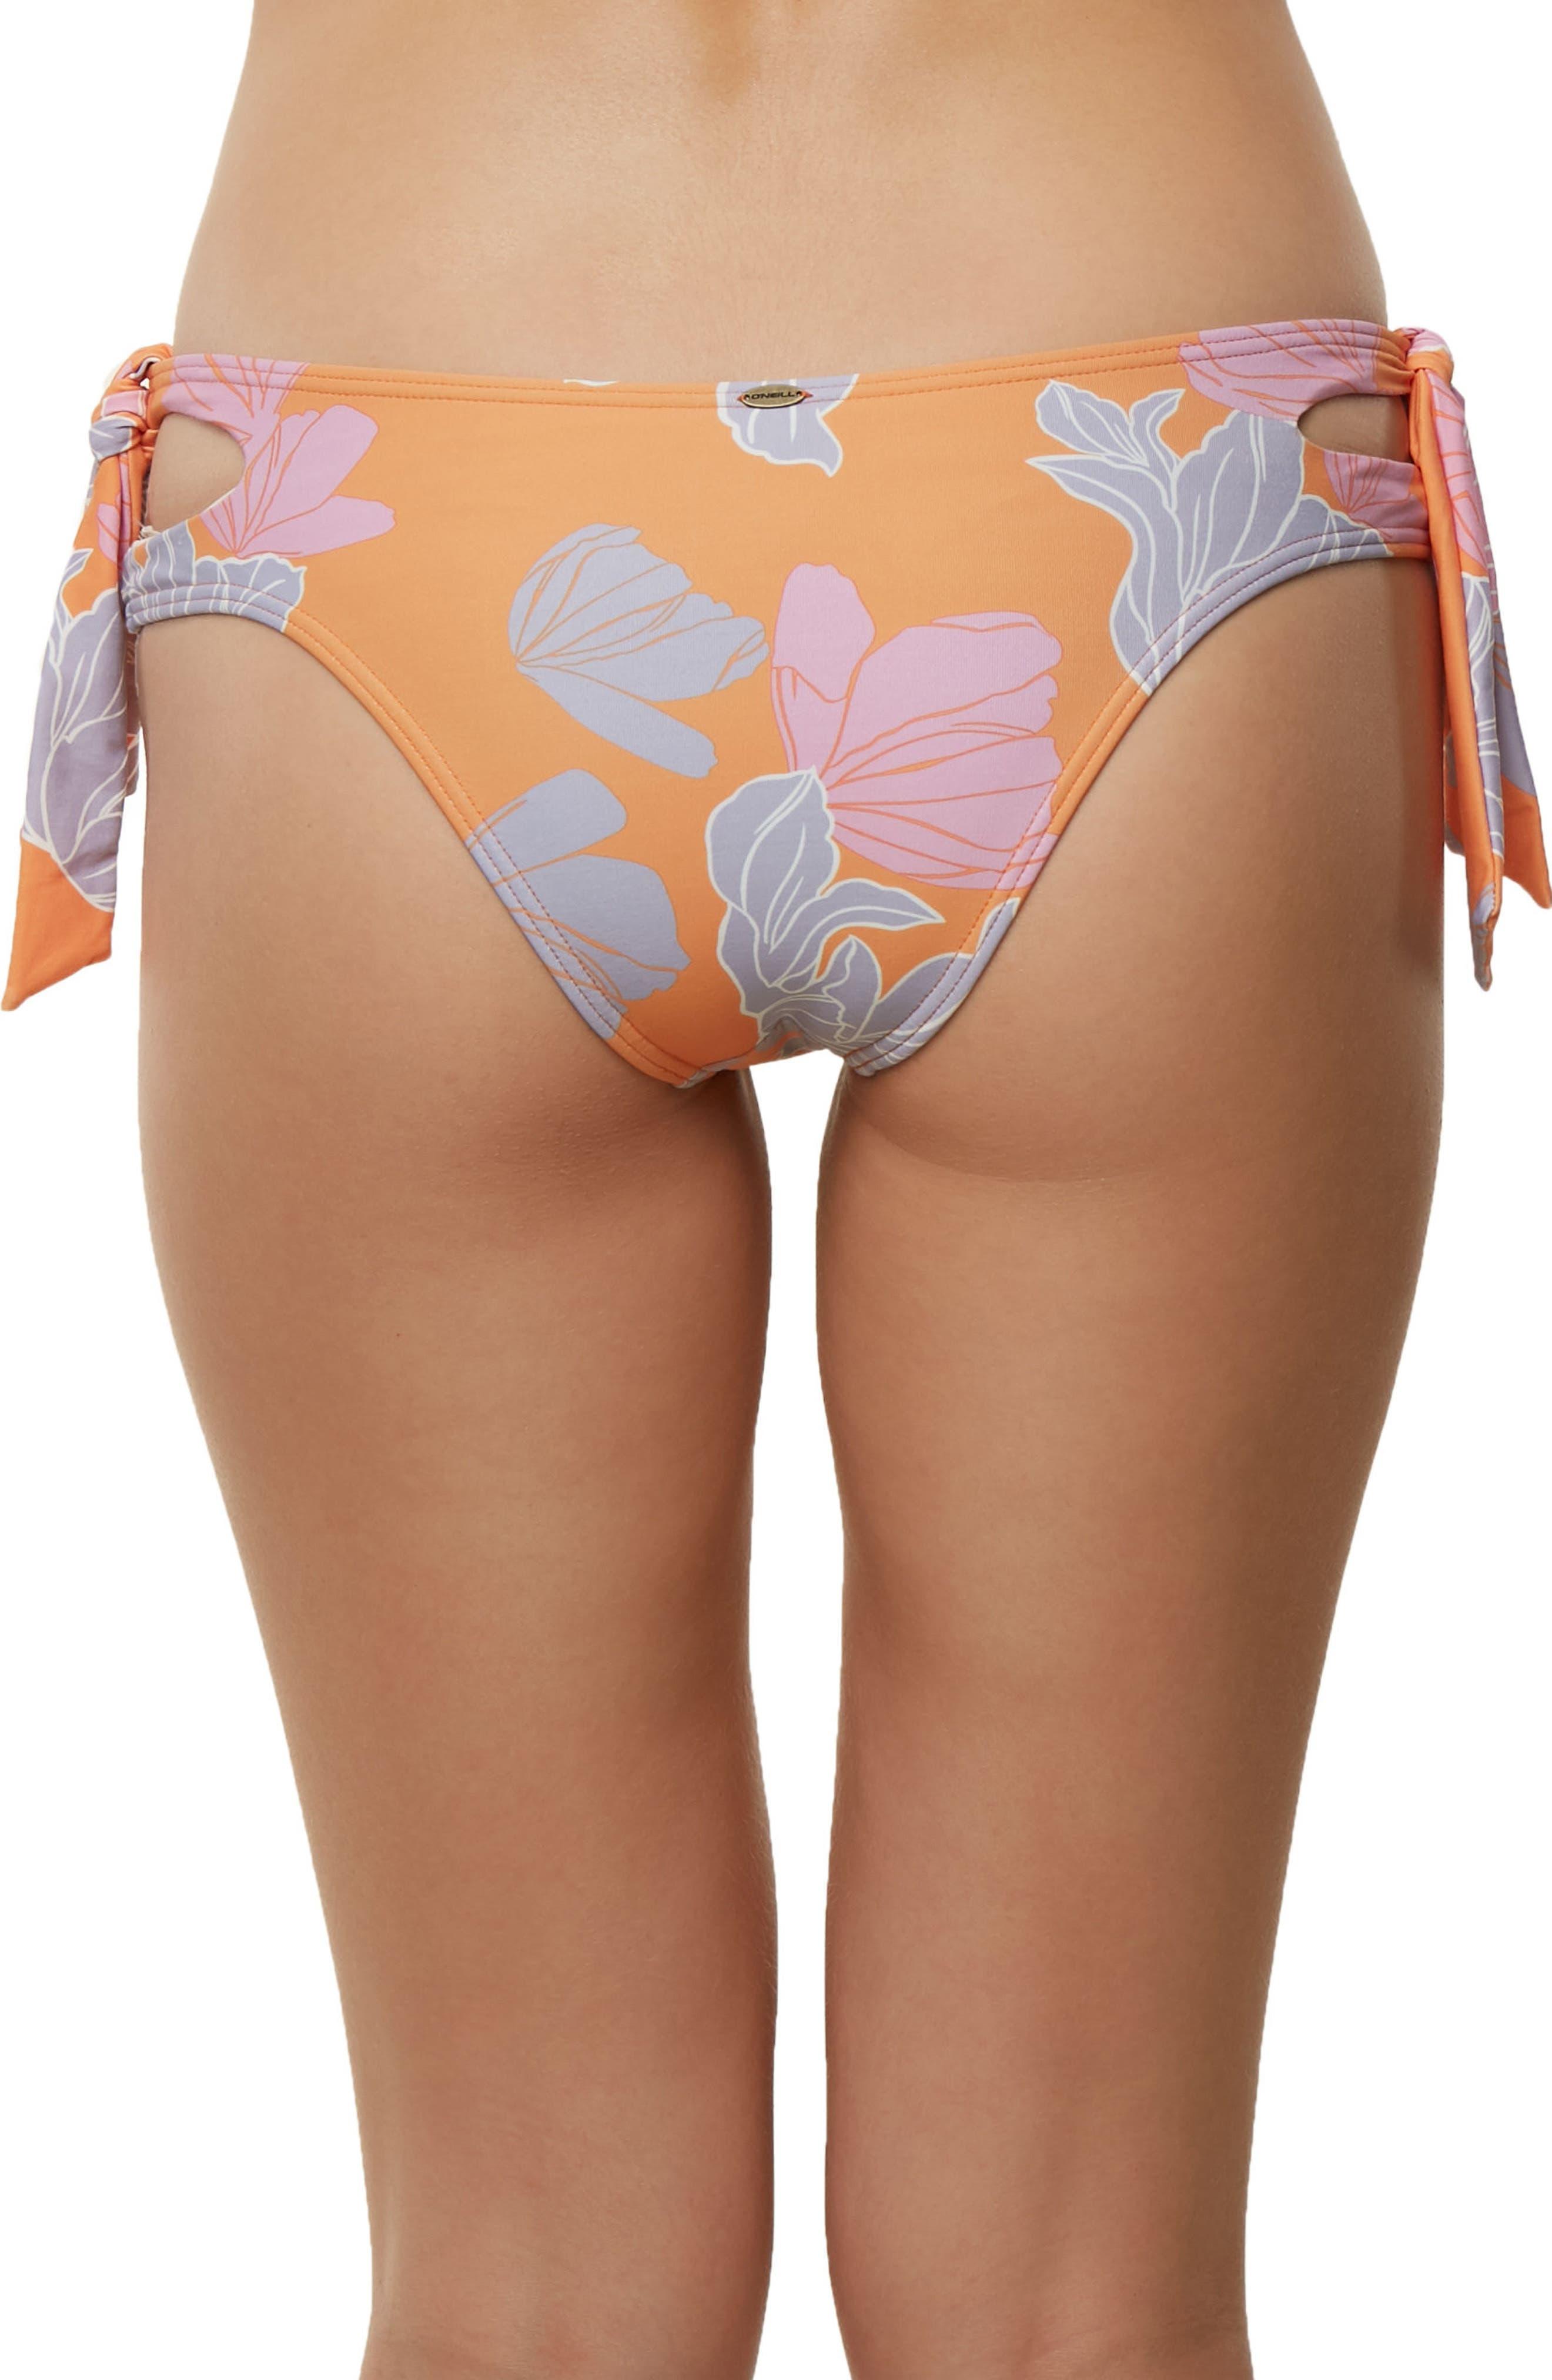 Zilla Side Tie Bikini Bottoms,                             Alternate thumbnail 2, color,                             Orange Multi